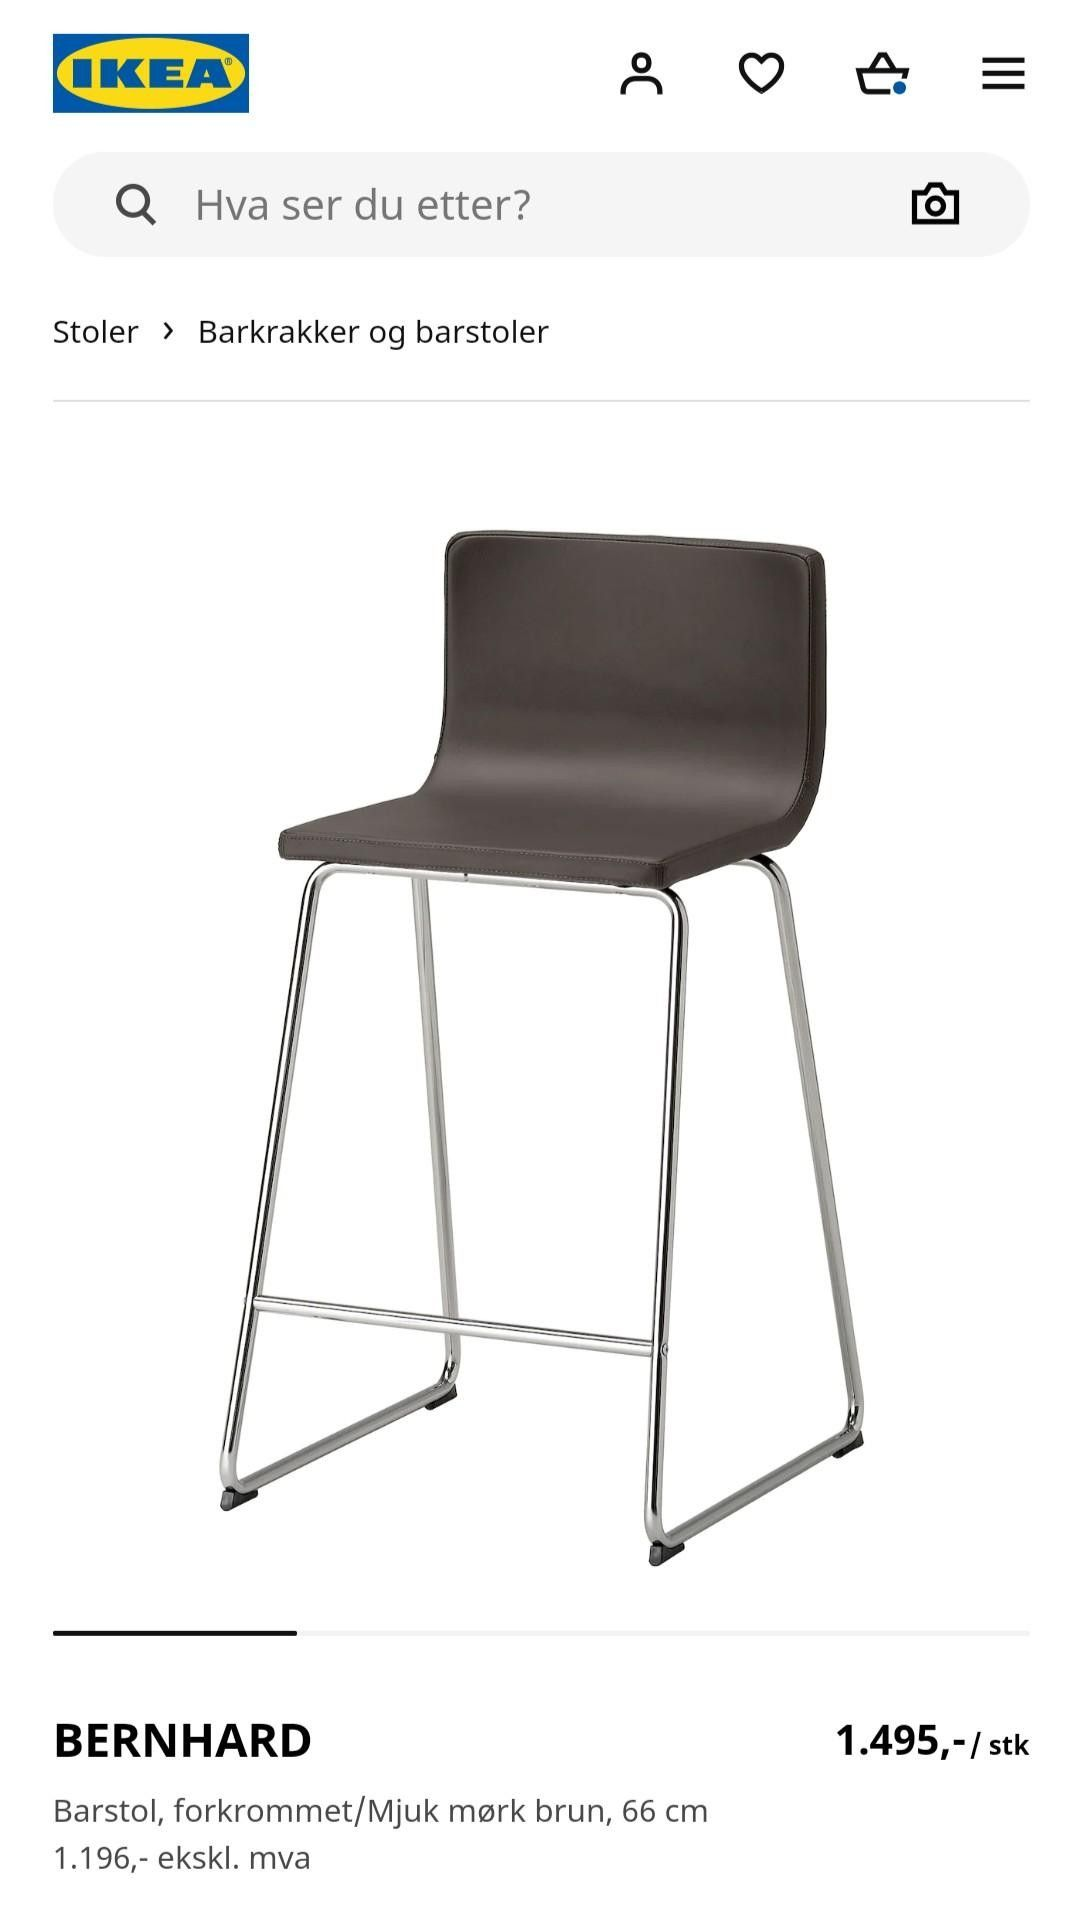 1stk IKEA Stol Bernhard Hvit Skinn | FINN.no